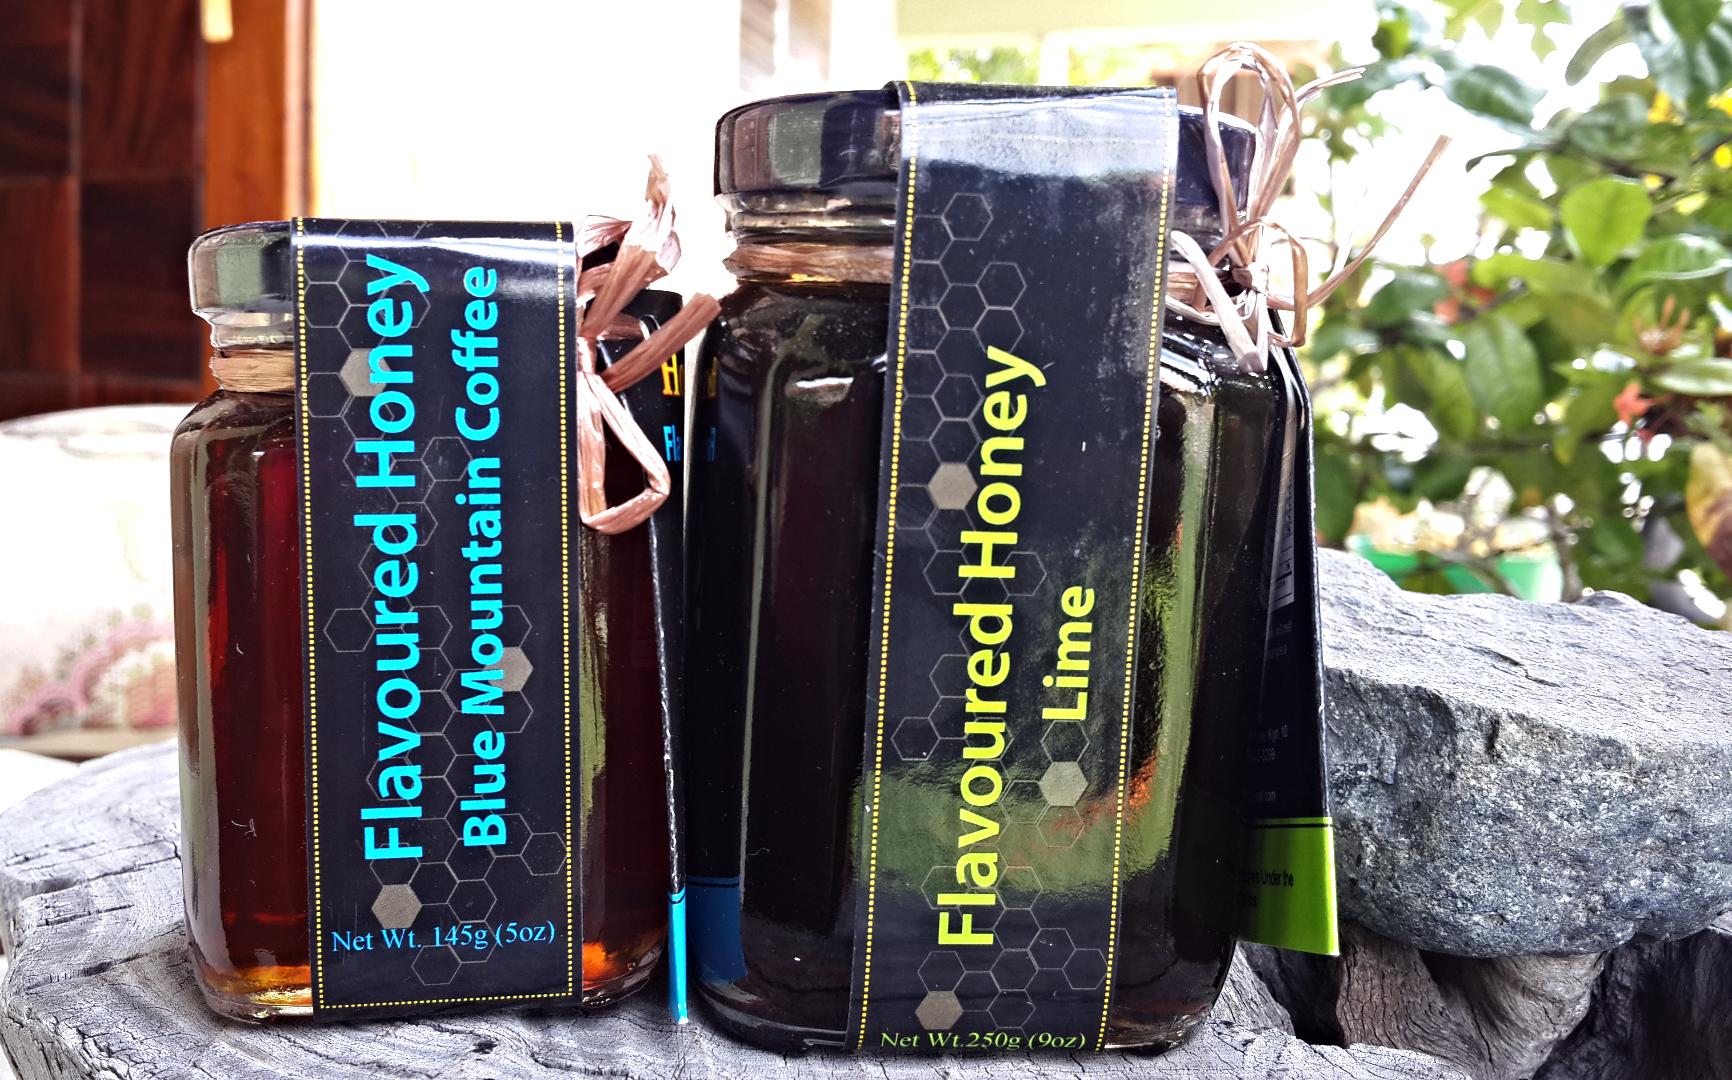 HoneyKist Flavoured Honey Fusions!